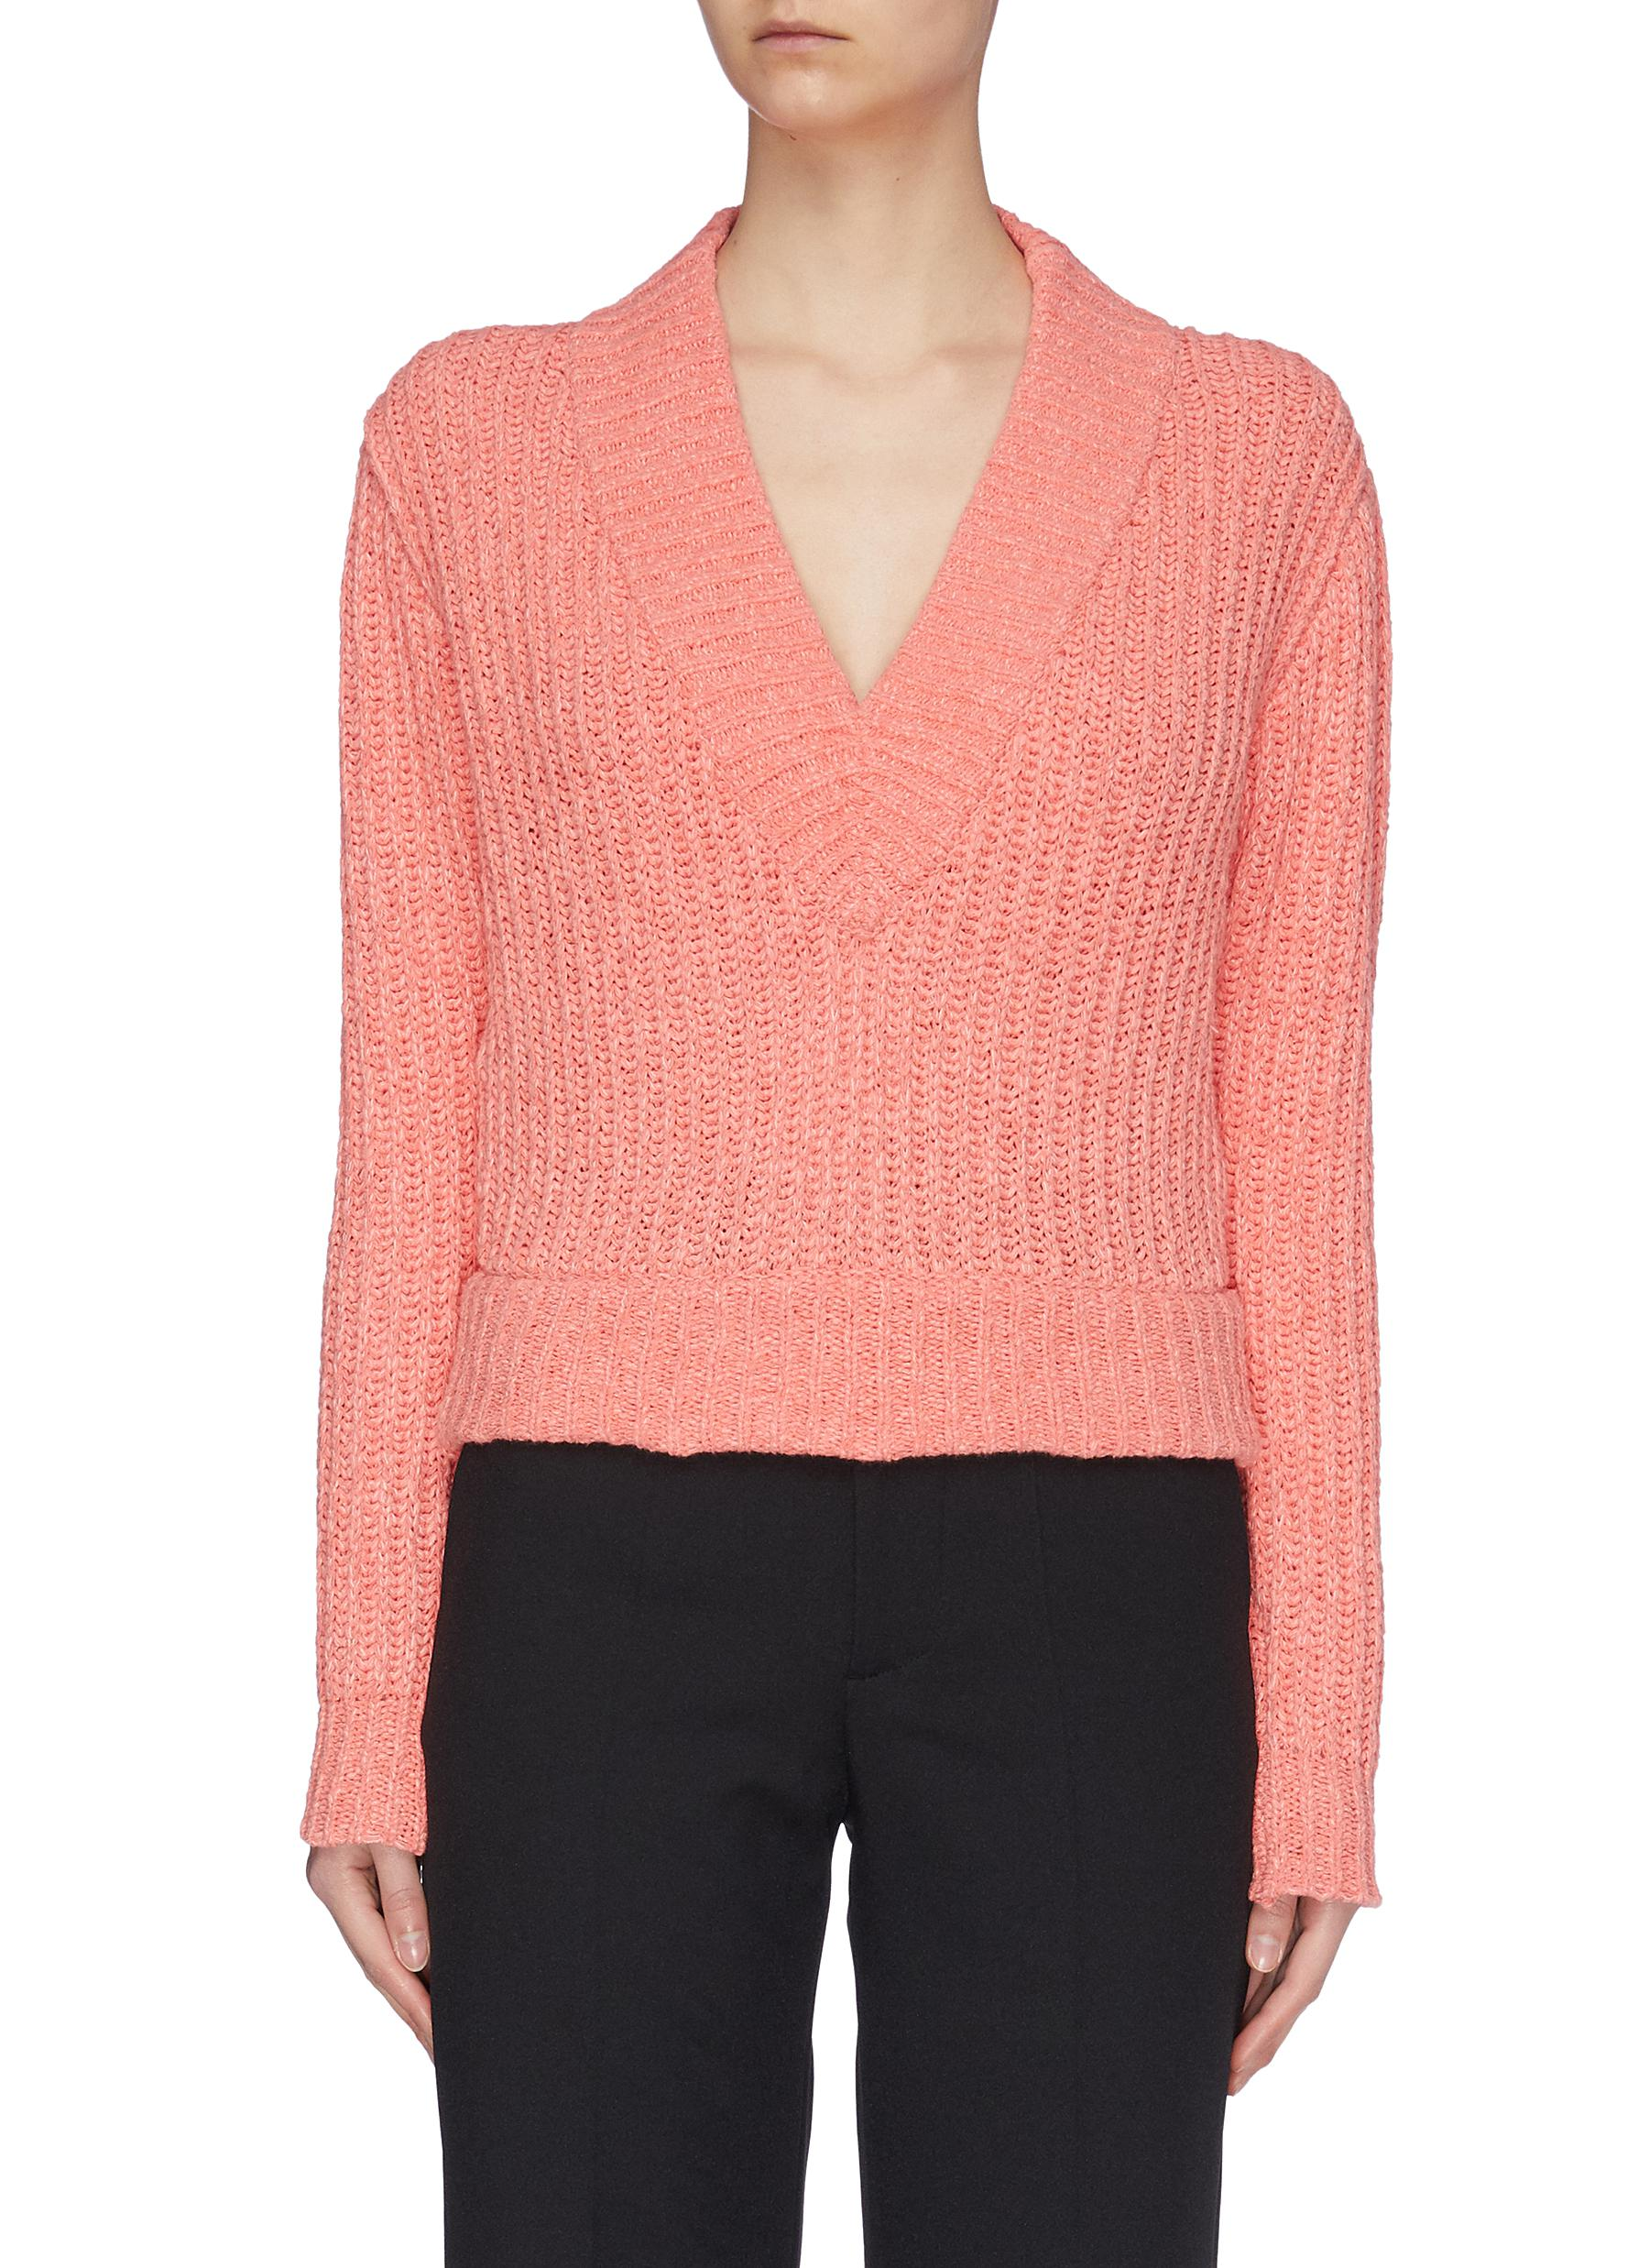 Buy Samuel Guì Yang Knitwear V-neck Yarn Sweater